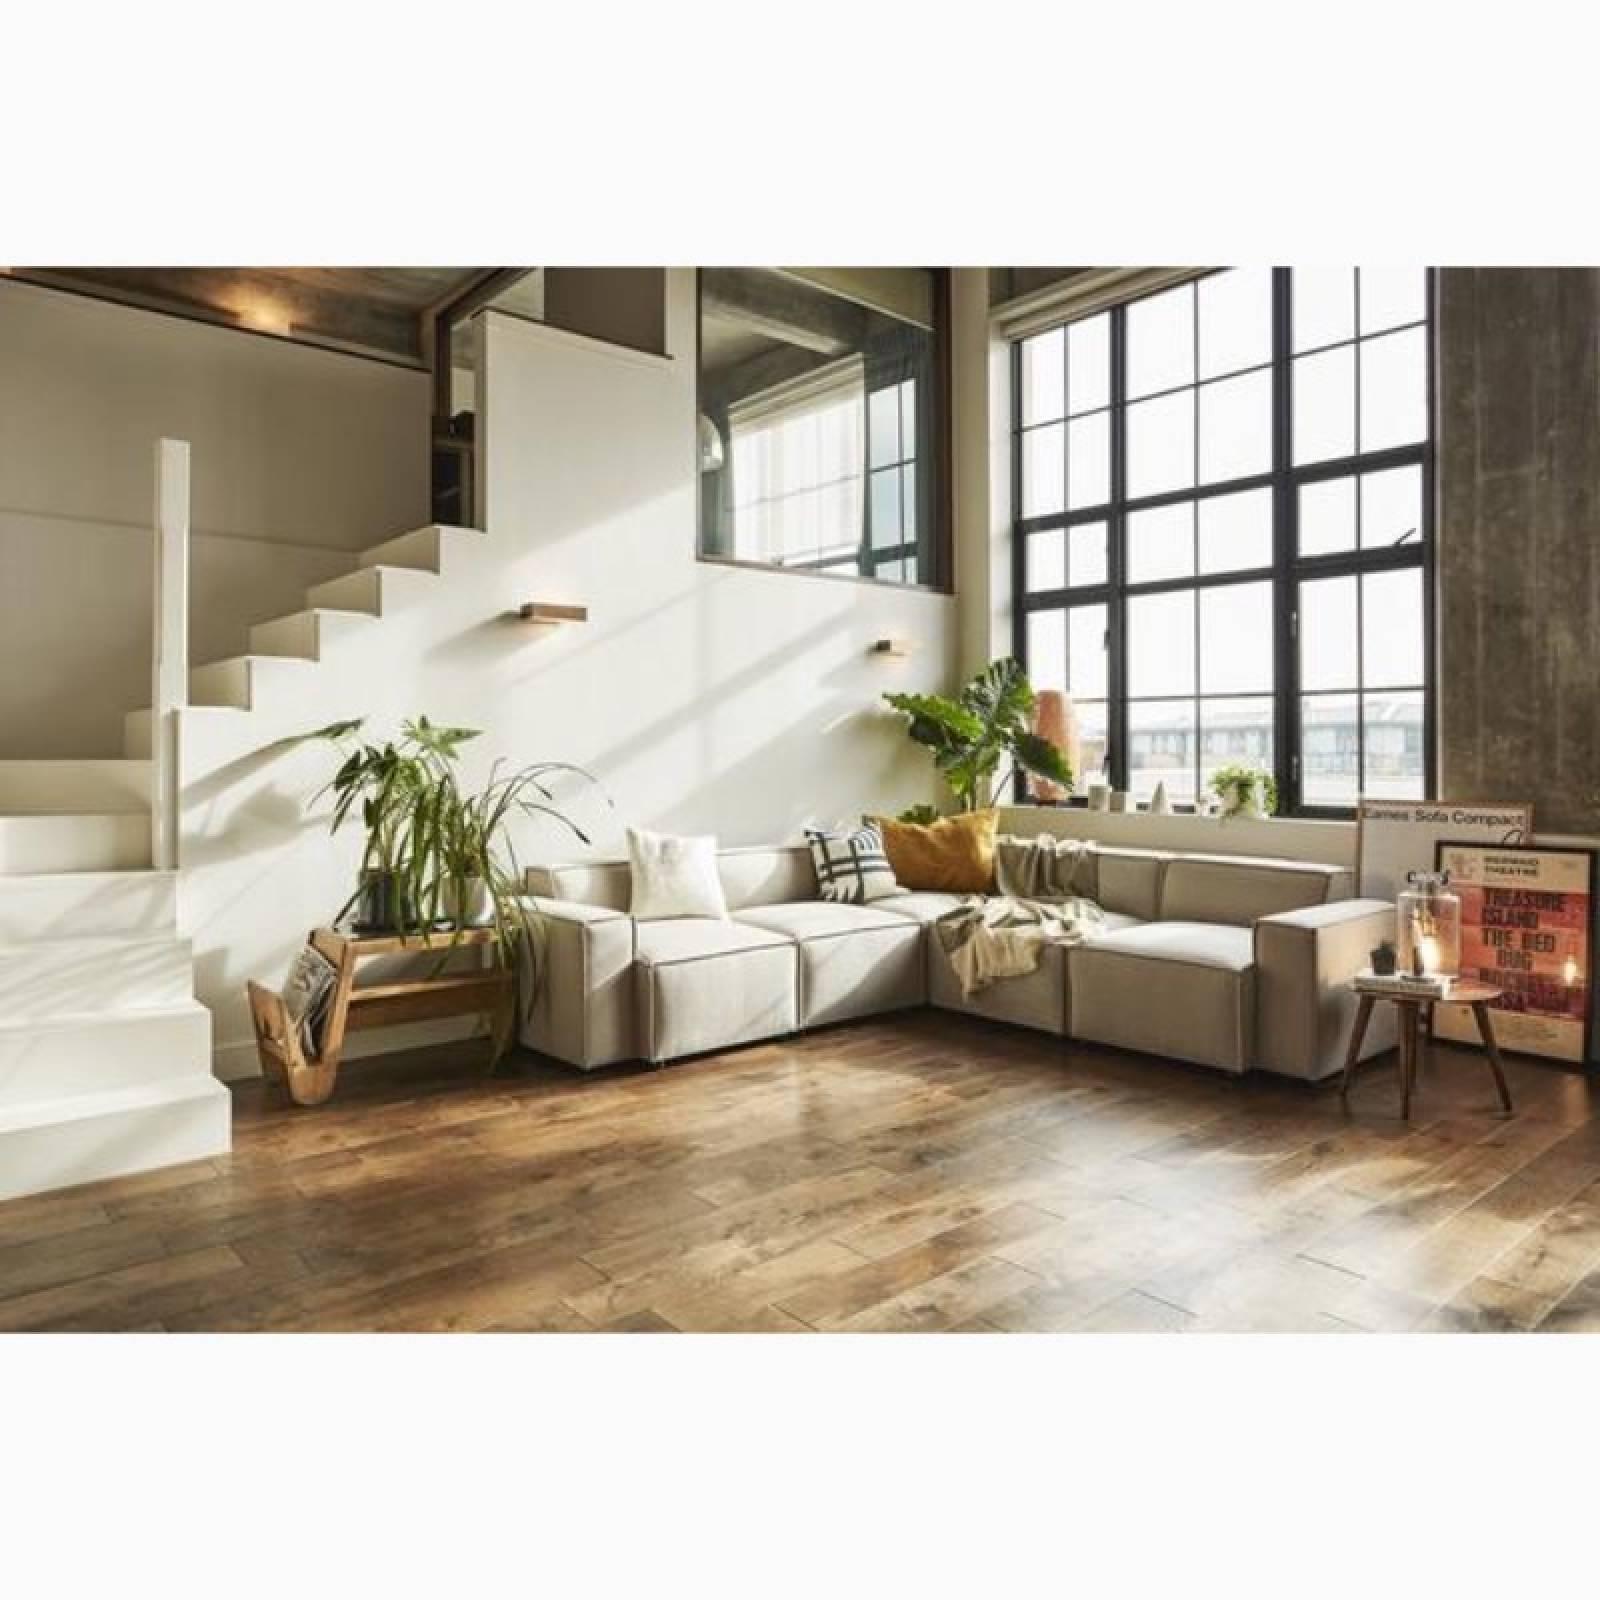 Swyft Model 03 - Corner Sofa - Linen Pumice thumbnails